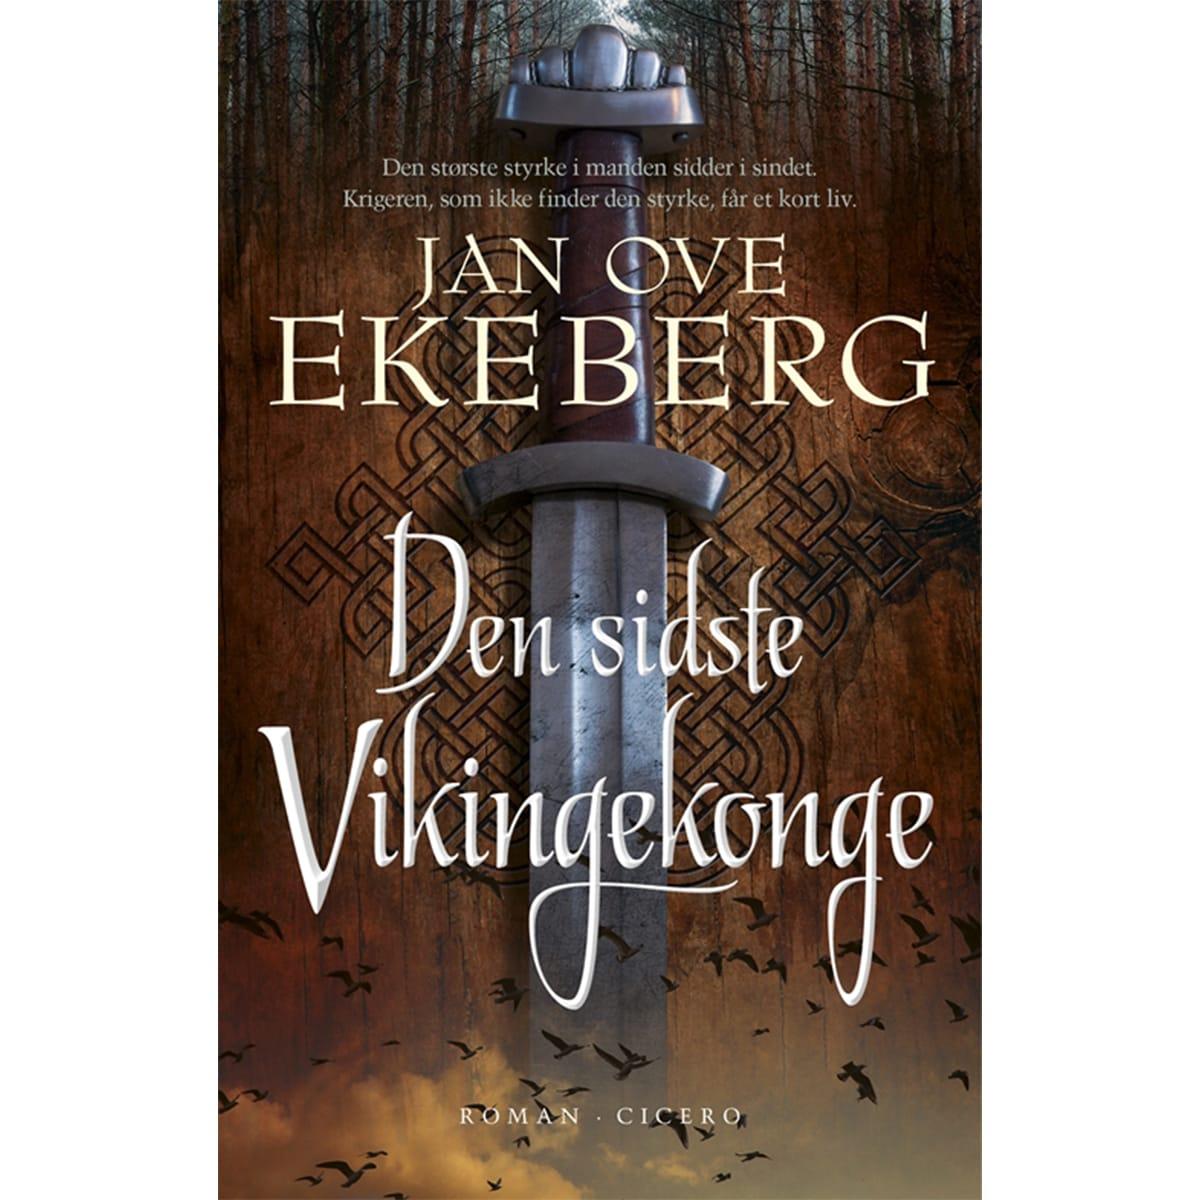 Af Jan Ove Ekeberg